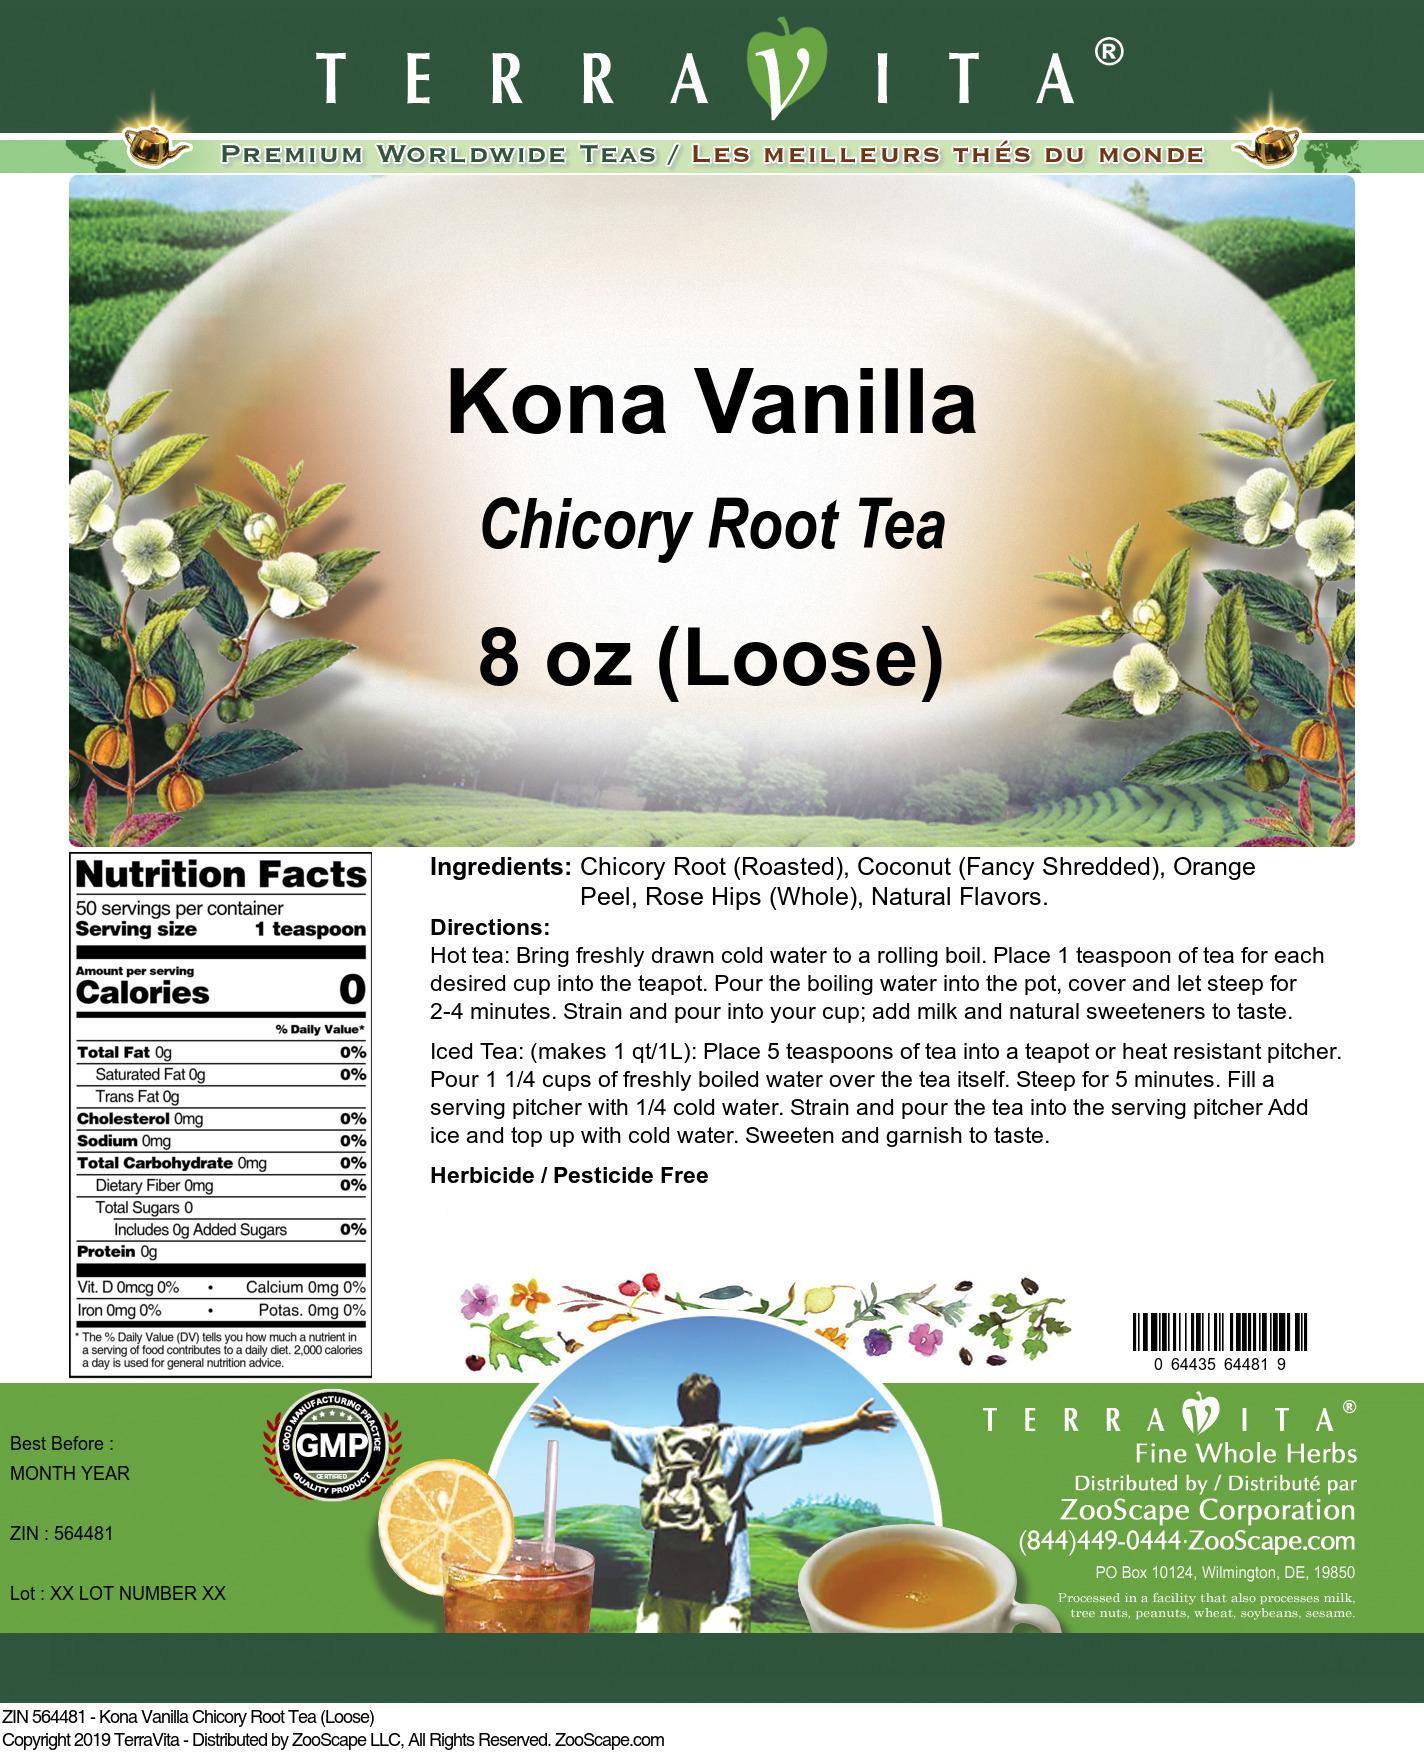 Kona Vanilla Chicory Root Tea (Loose)